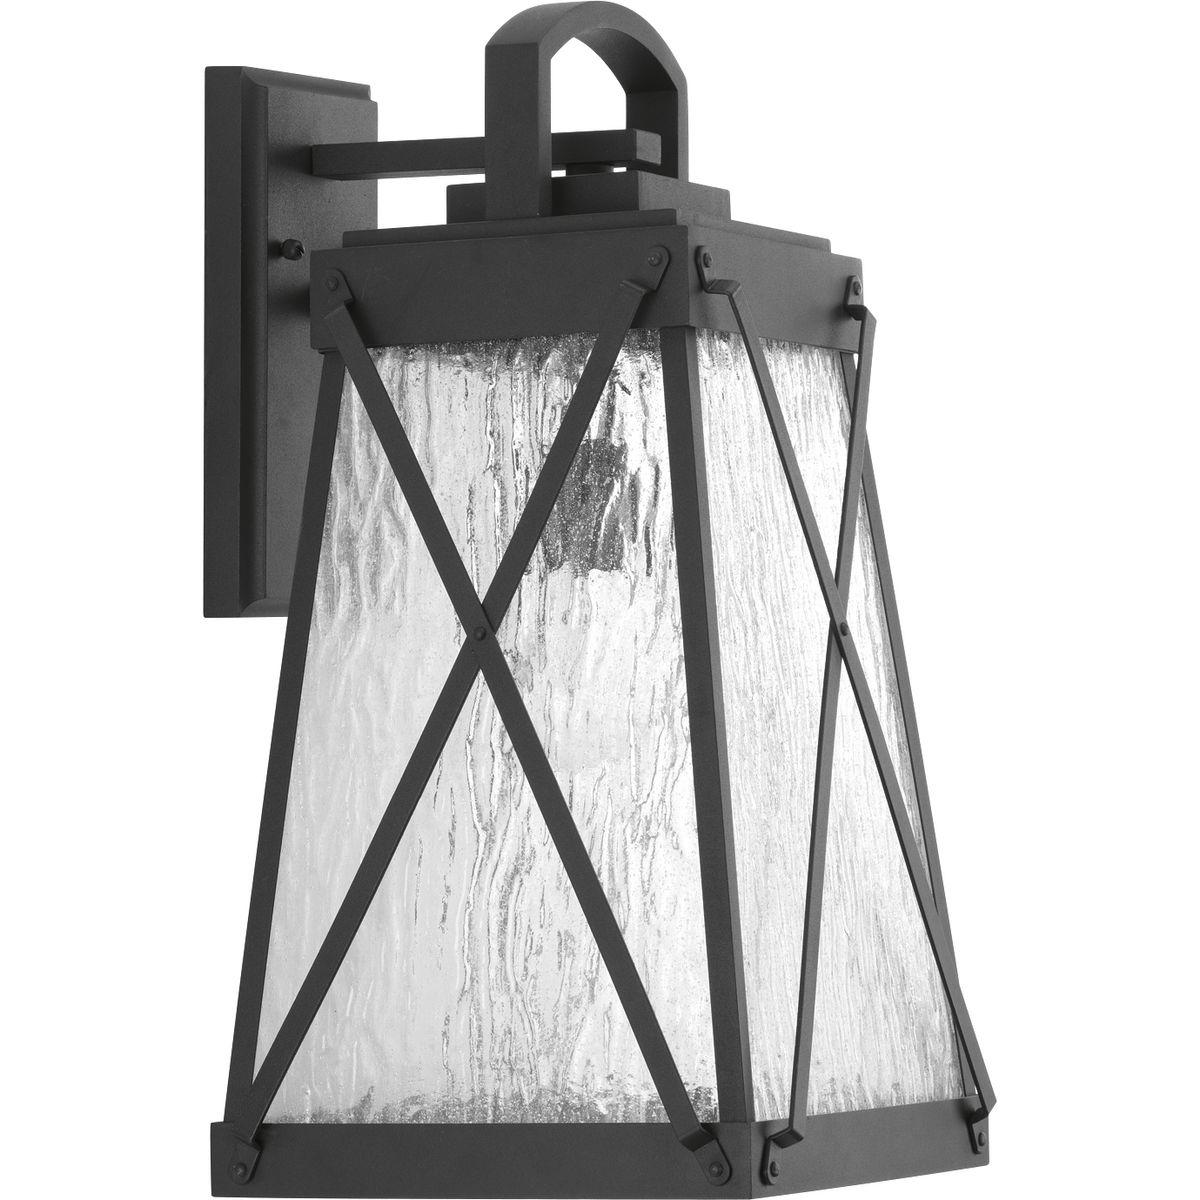 P560033-031 PROGRESS CREIGHTON 1-100W MED WALL LANTERN BLACK